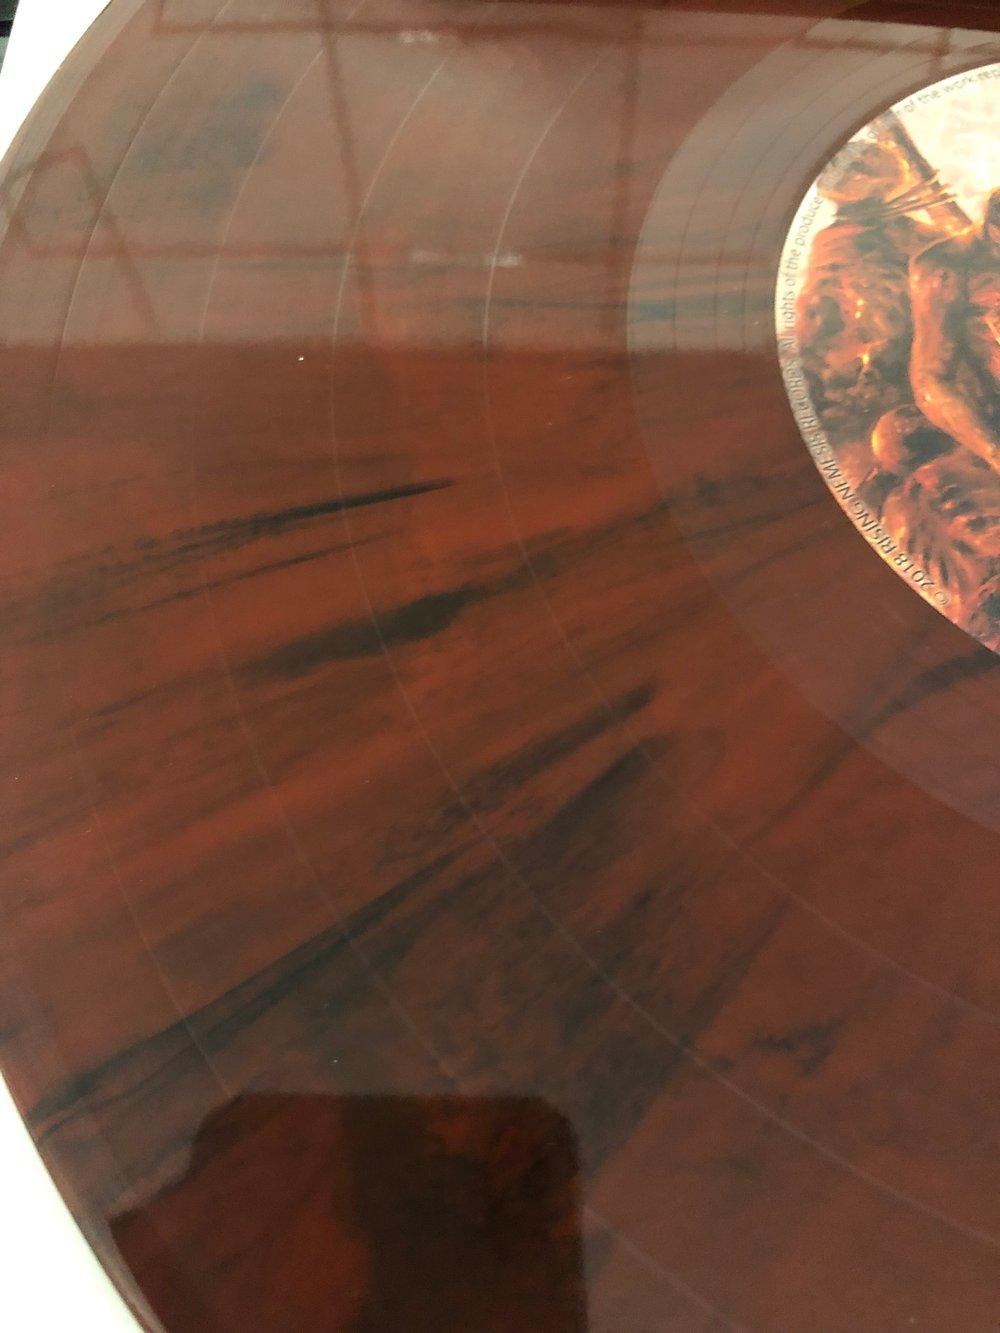 ACRANIUS - Reign of Terror 180g GATEFOLD LP incl. Downloadcode